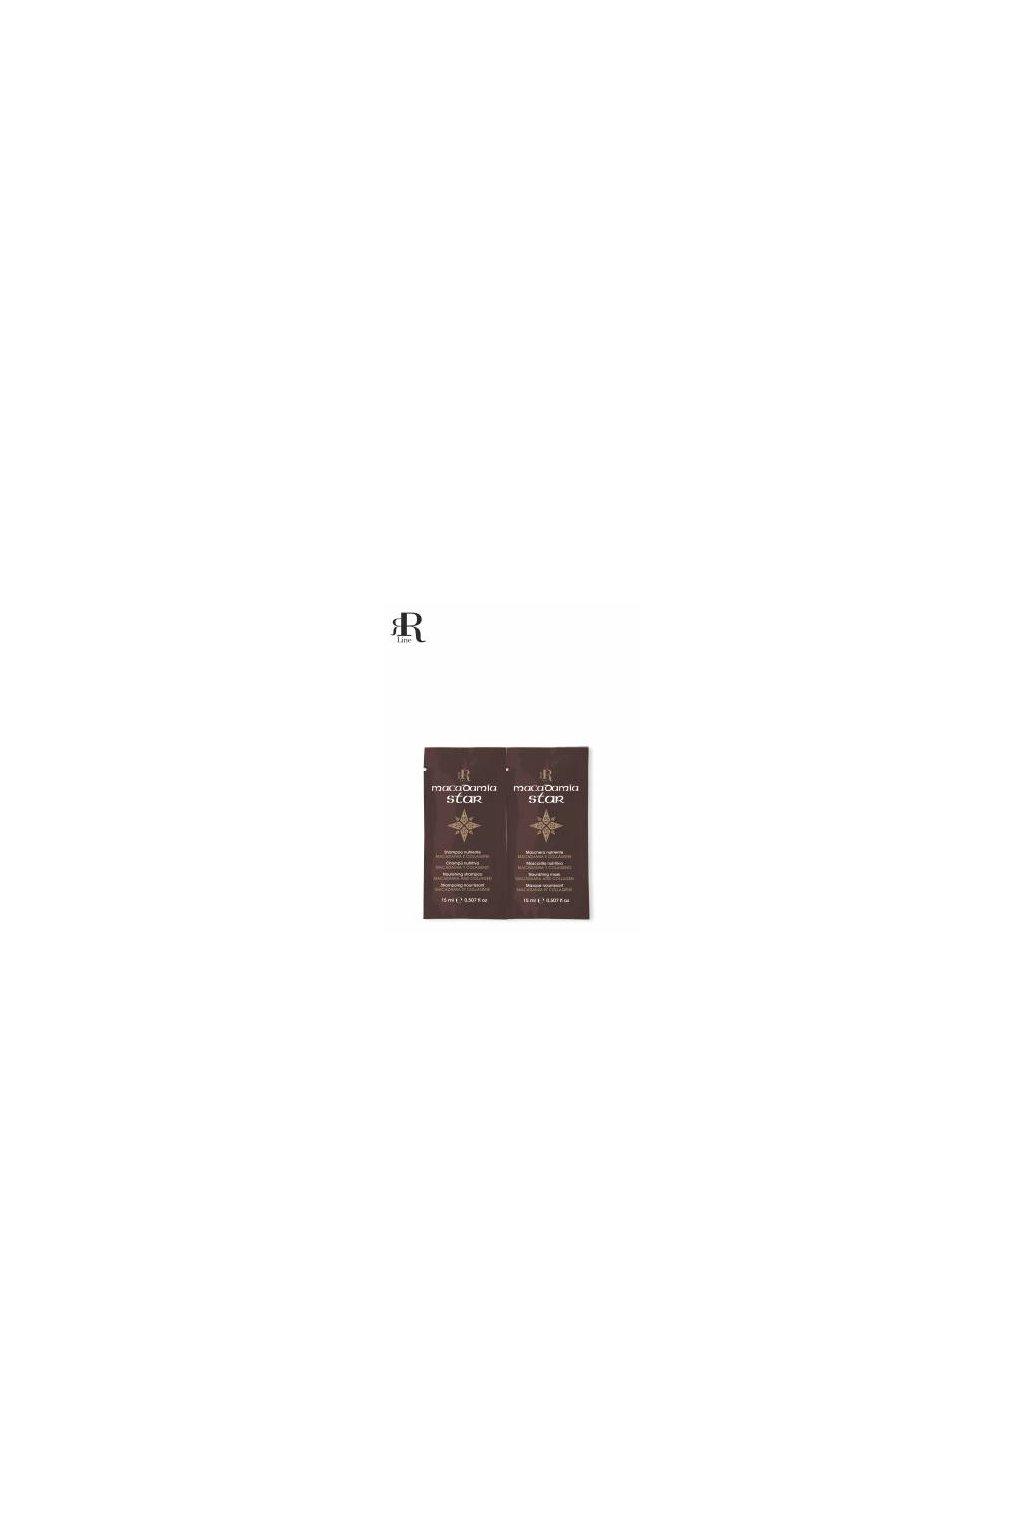 9236 rr line macadamia star sampon a maska vyzivujici namahane vlasy 2x15ml